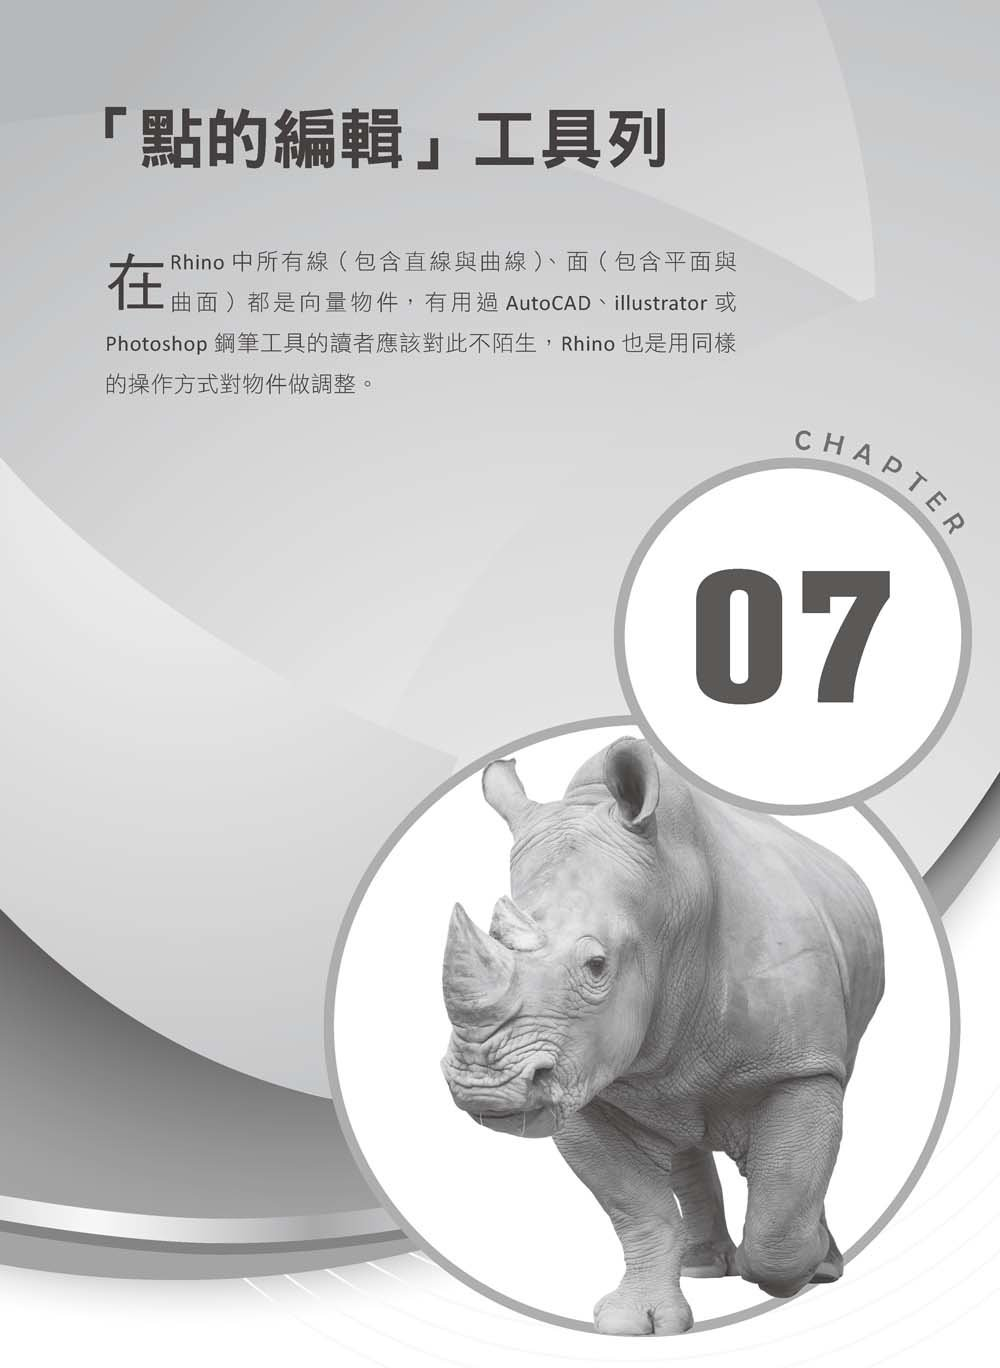 Rhinoceros 6 全攻略:自學設計與 3D建模寶典-preview-21